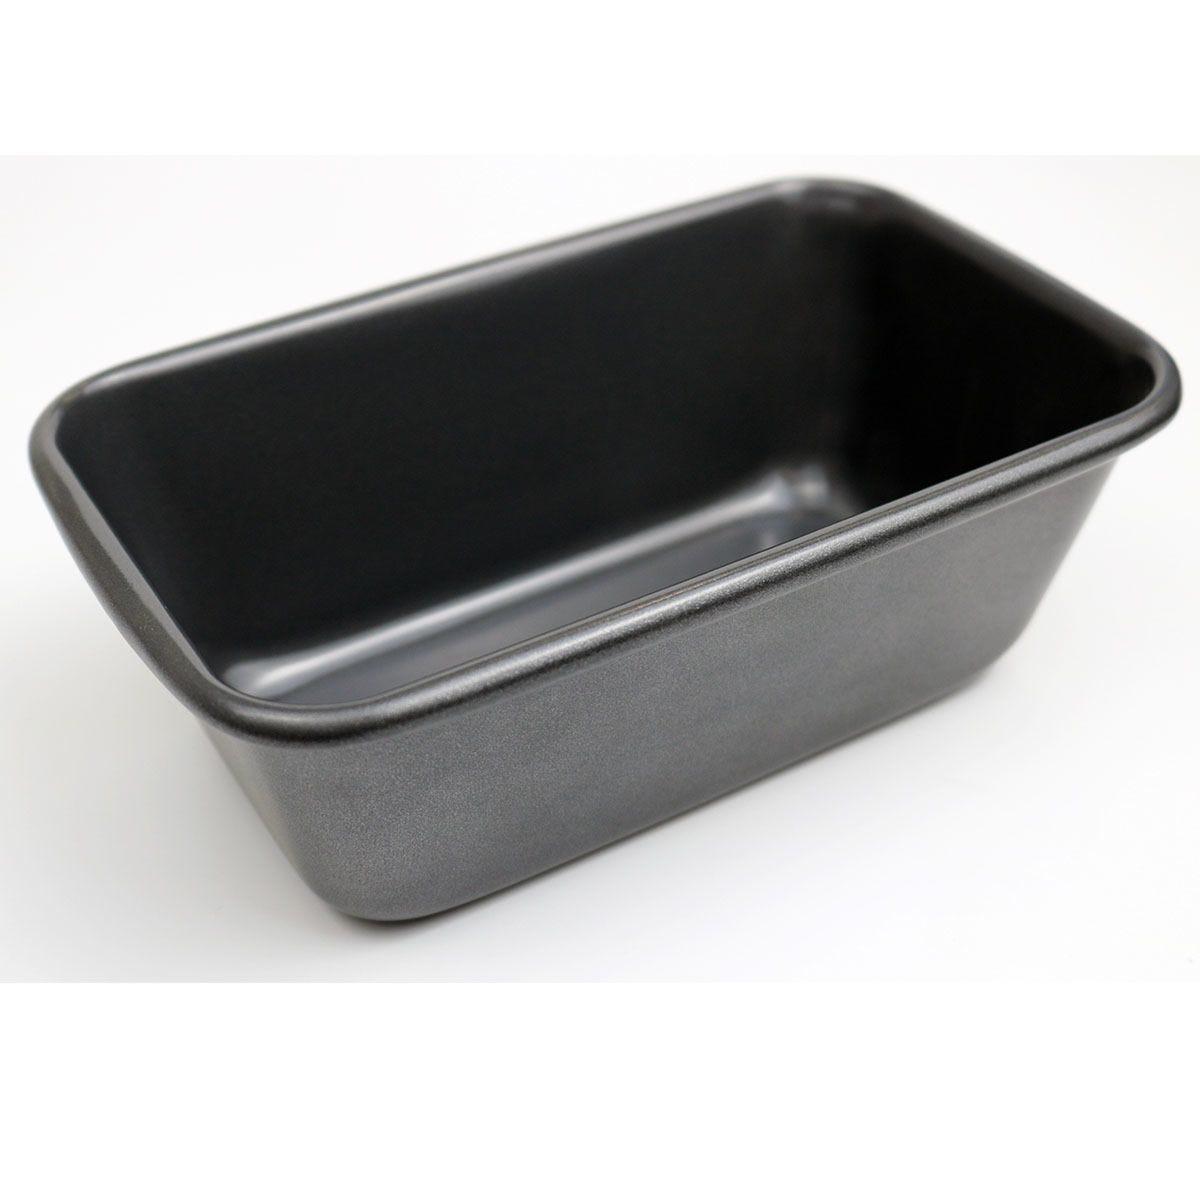 Robert Dyas Small Loaf Pan